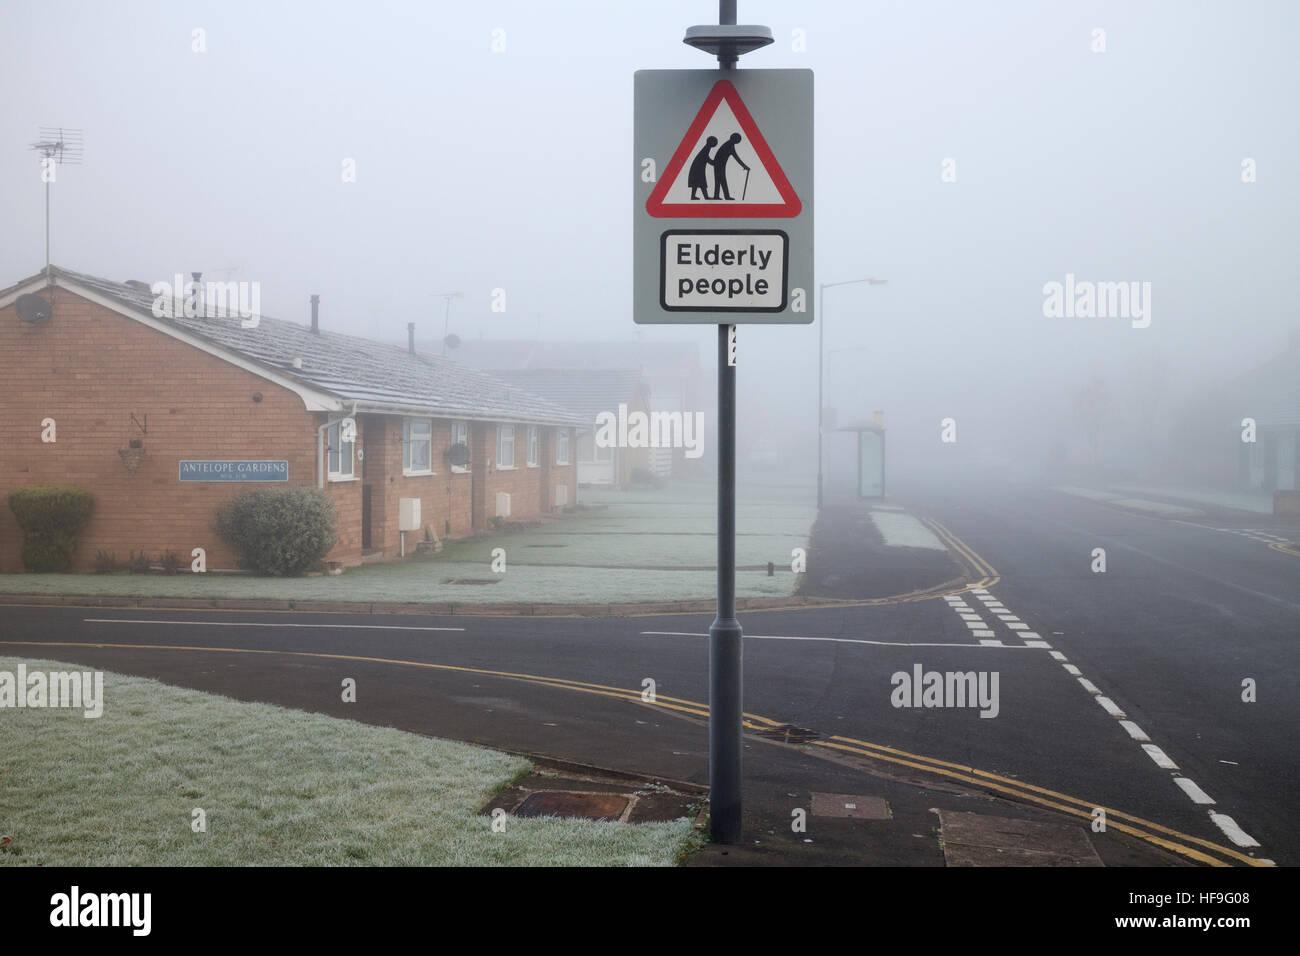 Elderly people road sign in freezing foggy weather by elderly people`s housing, Warwick, UK - Stock Image